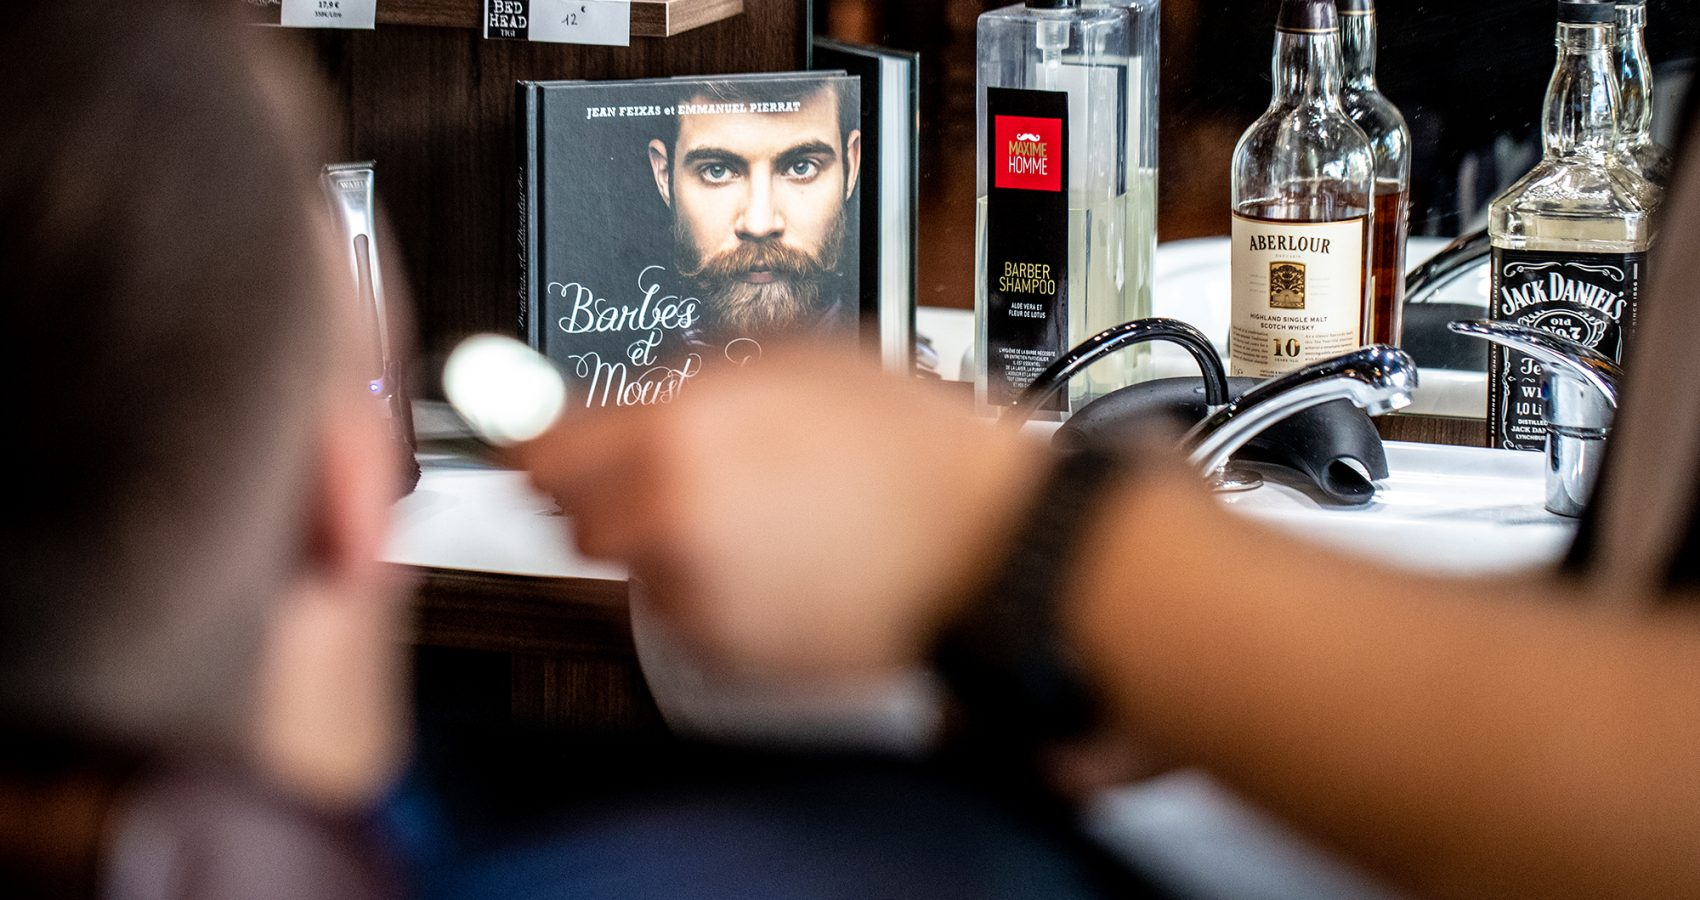 Maxime-homme-page-accueil-barbier-coiffeur--orfevres4